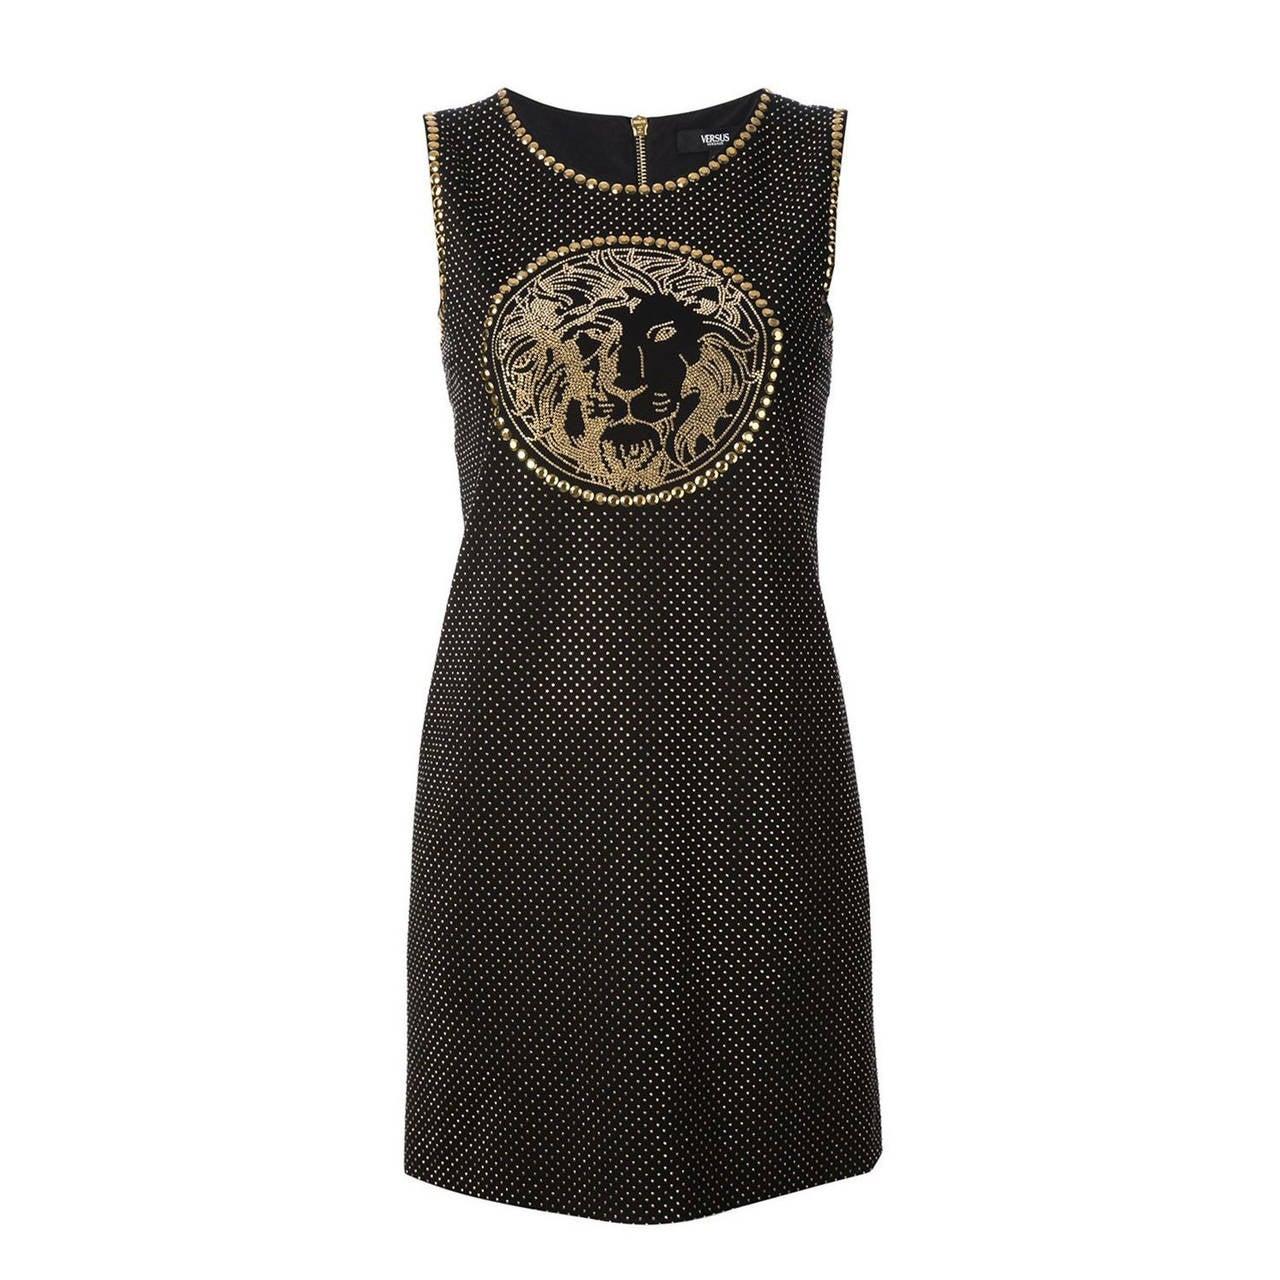 New Versace Versus Black Gold Studded Lionhead Dress 1